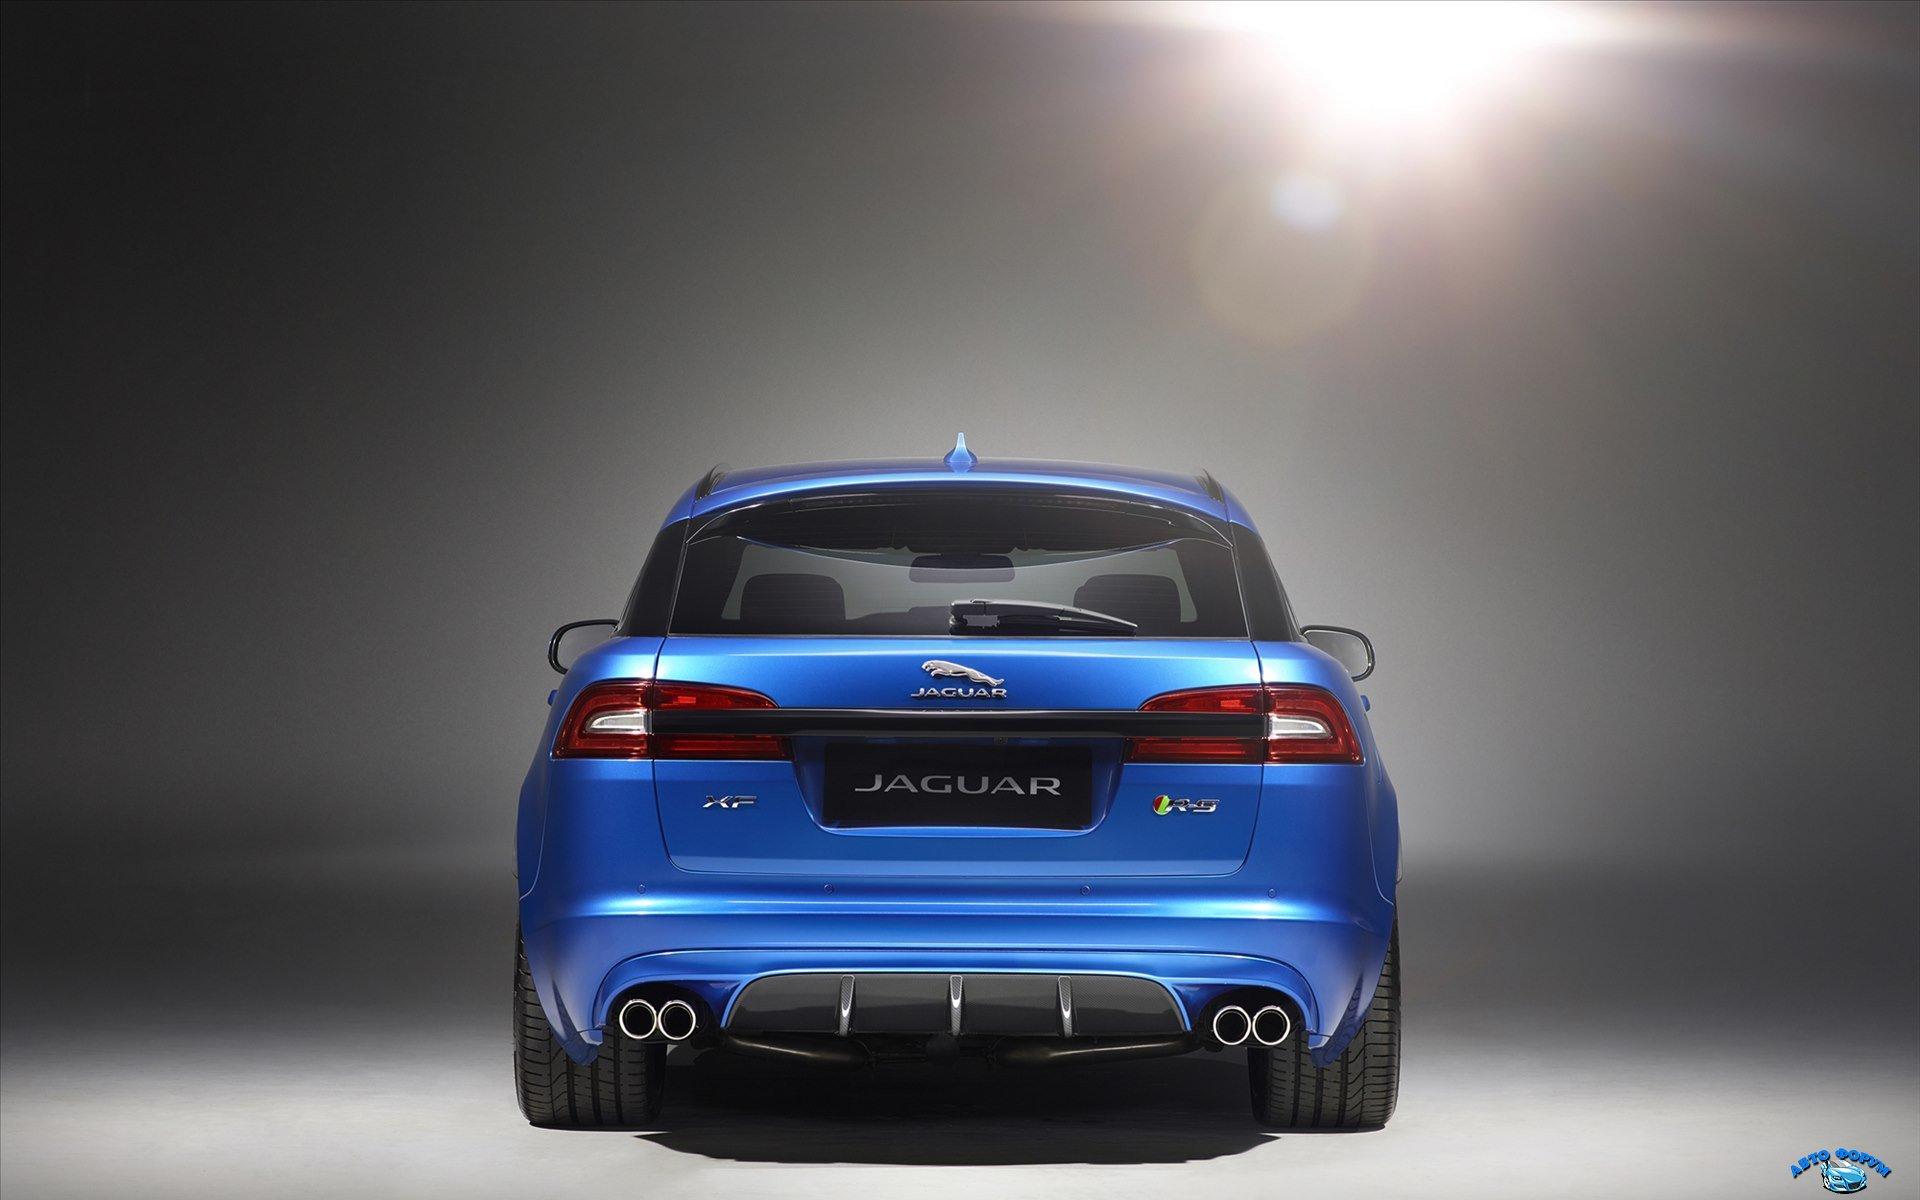 Jaguar-XFR-S-Sportbrake-2015-widescreen-28.jpg